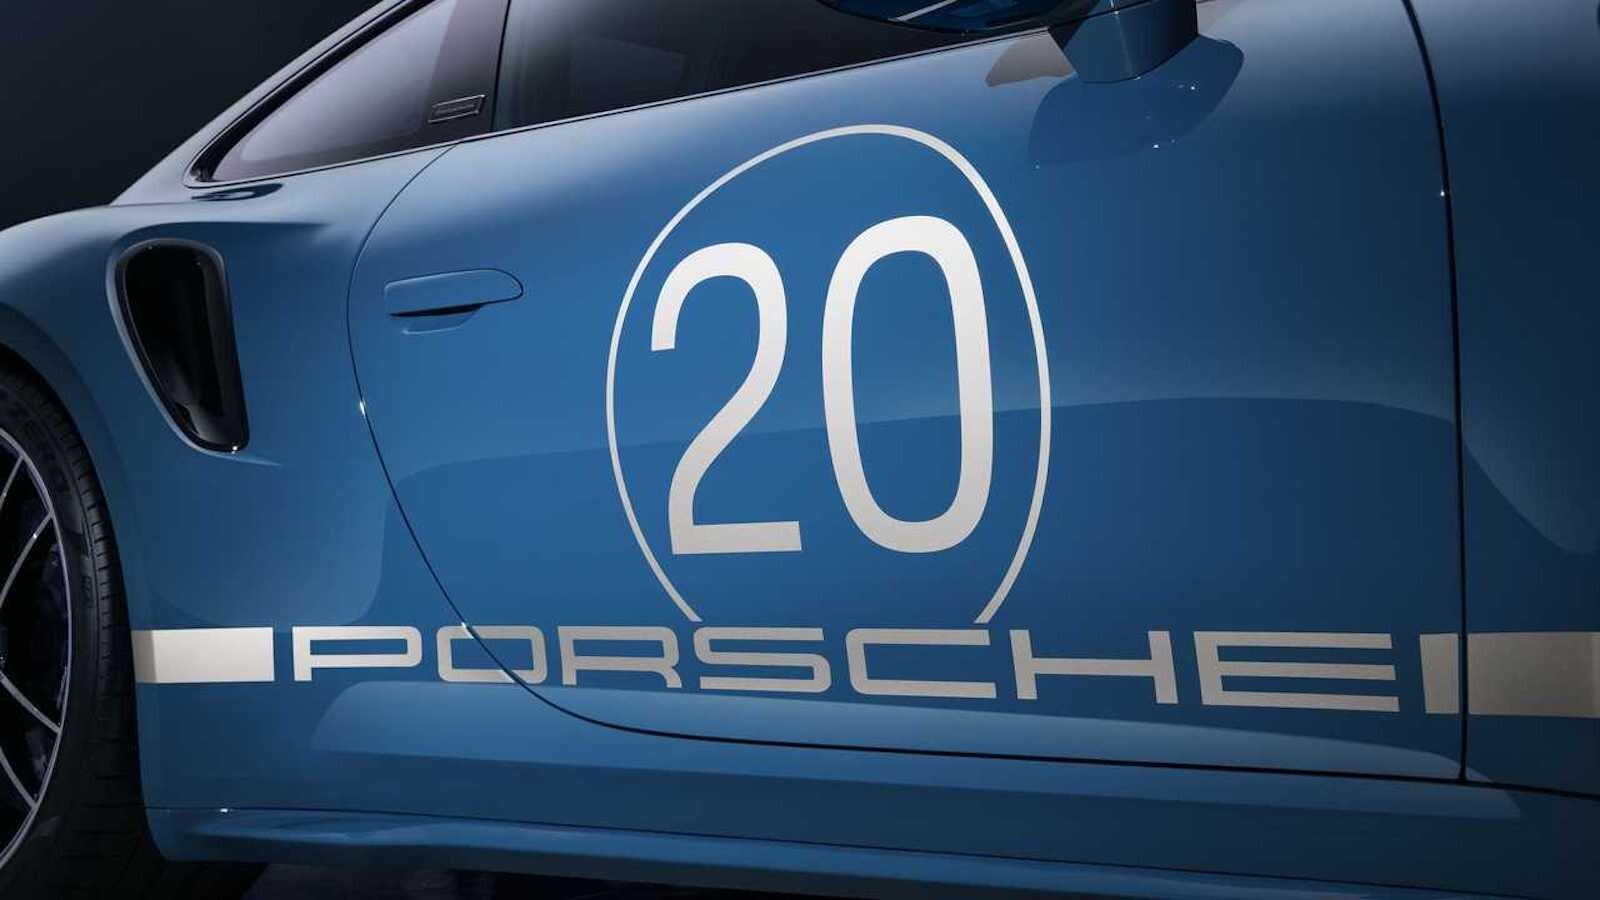 Foto de Porsche 911 20 Aniversario en China (5/9)